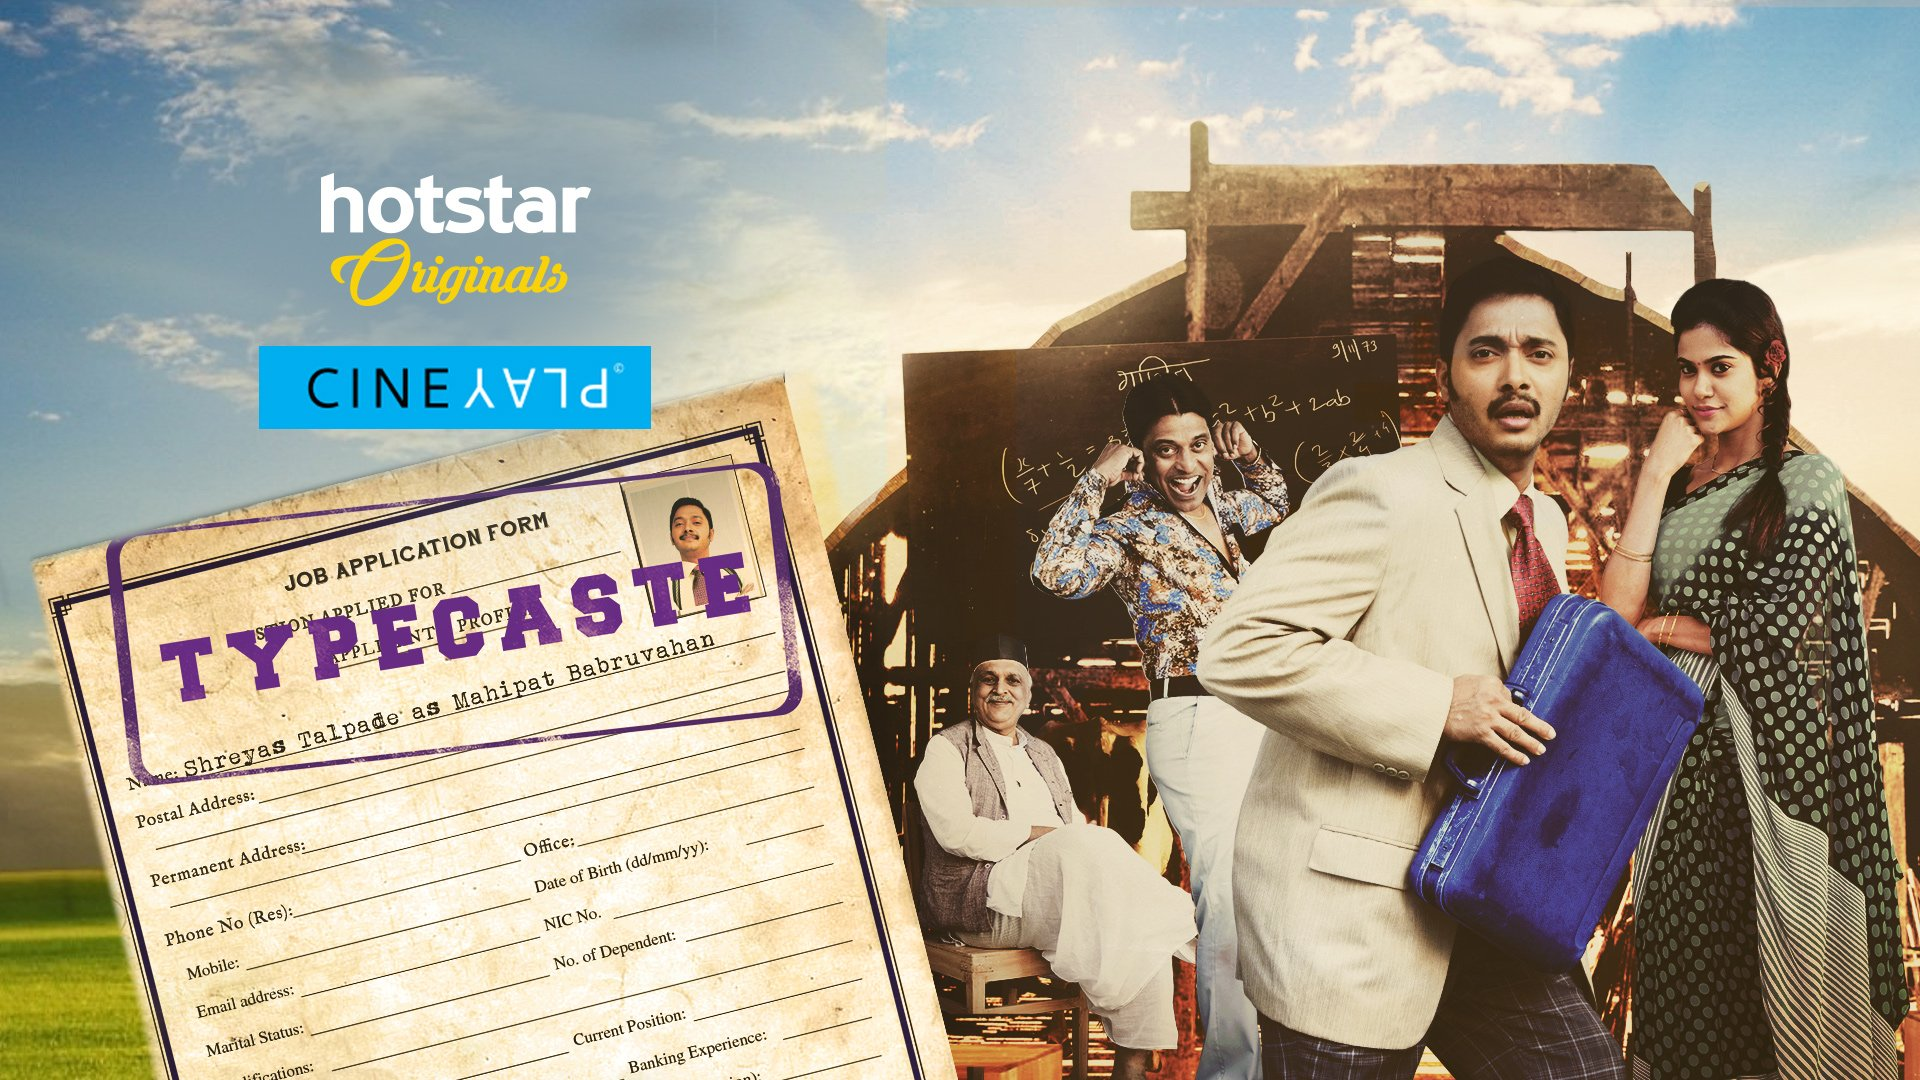 stree movie online hotstar